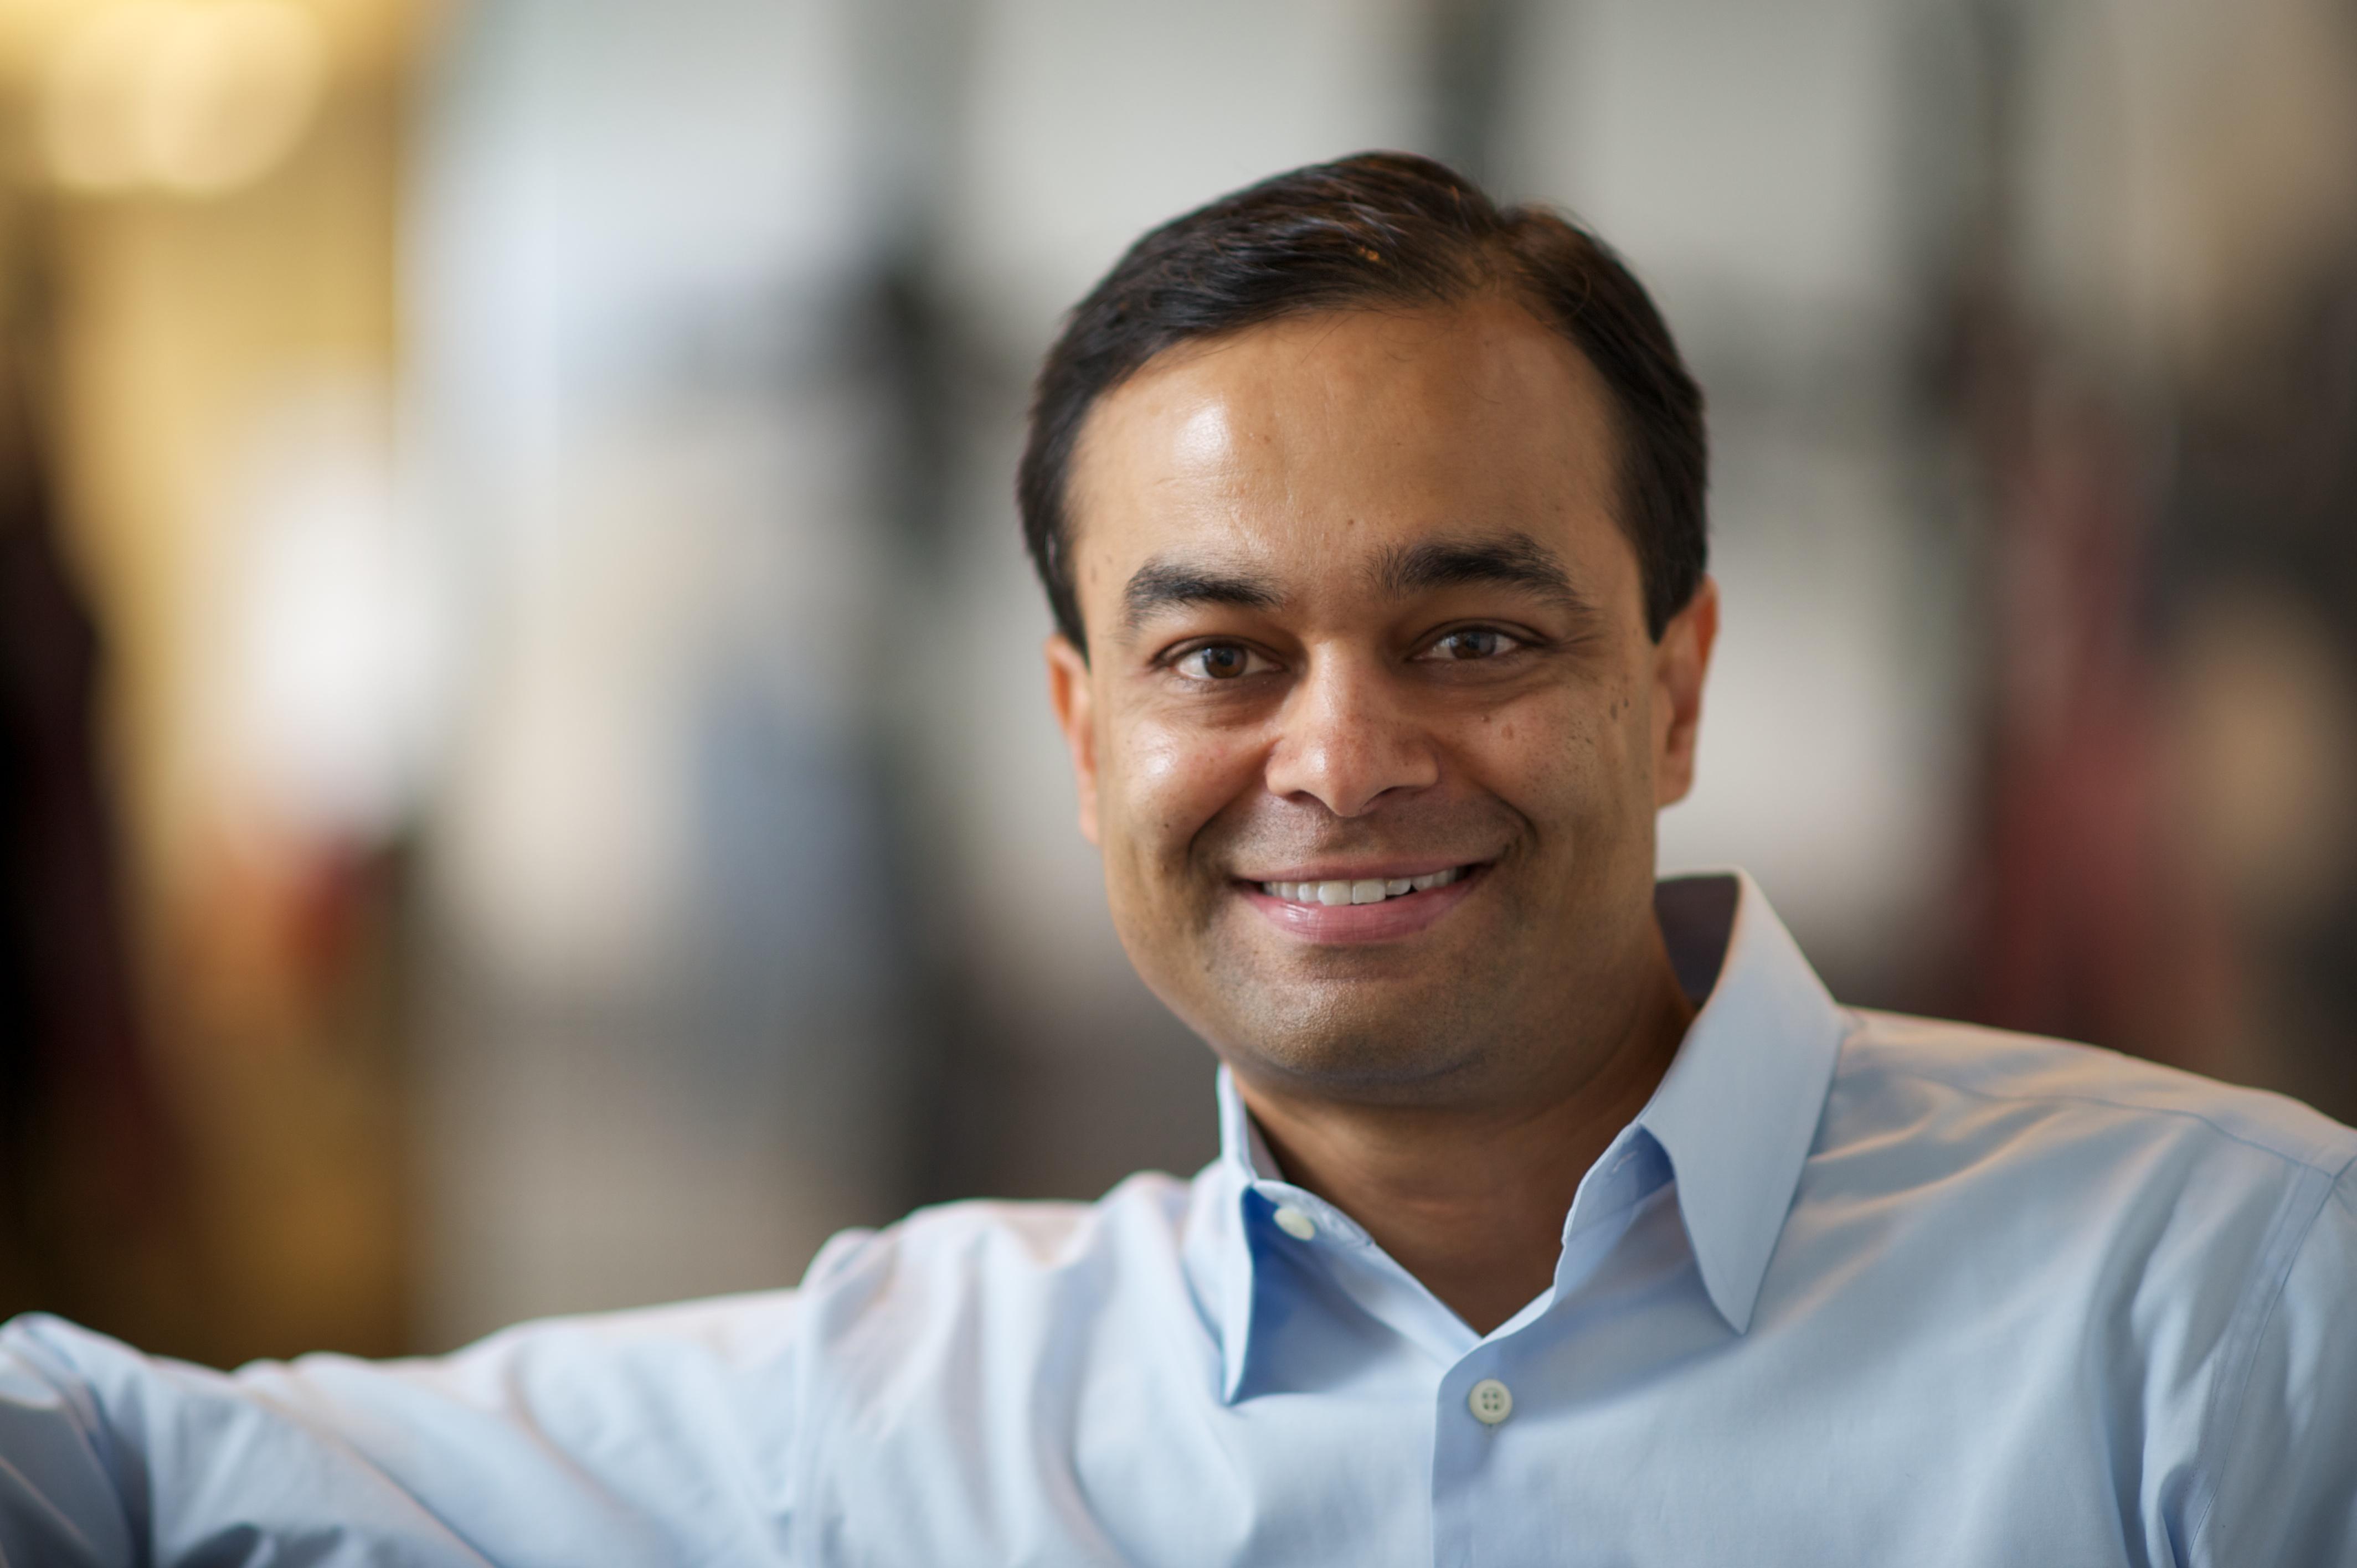 Sean Aggarwal, Trulia's new CFO